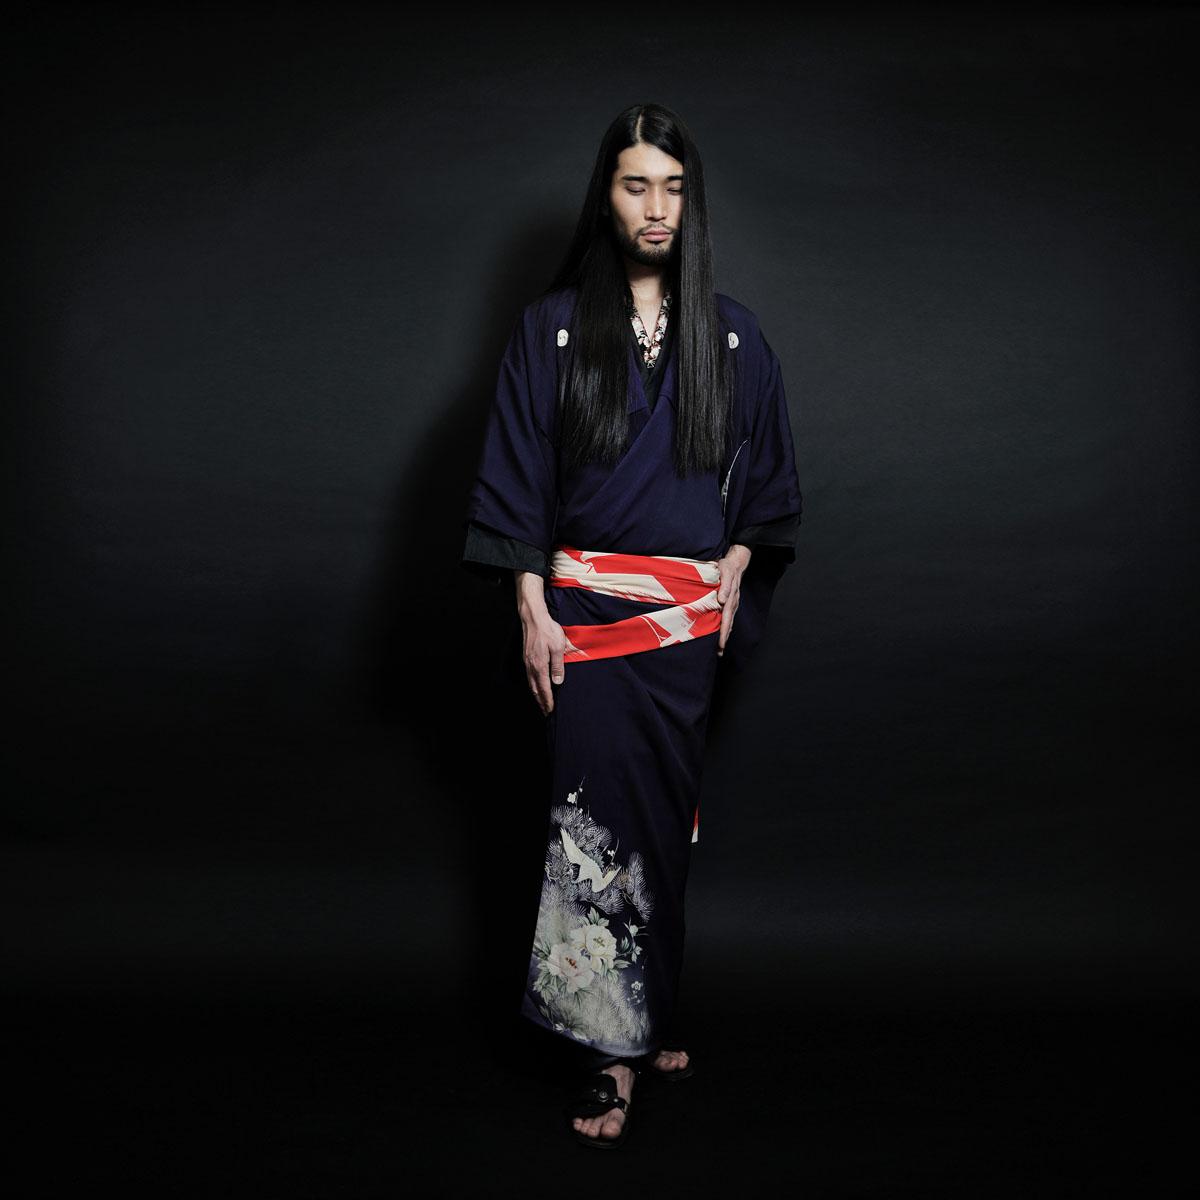 http://tokyobling.files.wordpress.com/2011/01/male_kimono_1.jpg